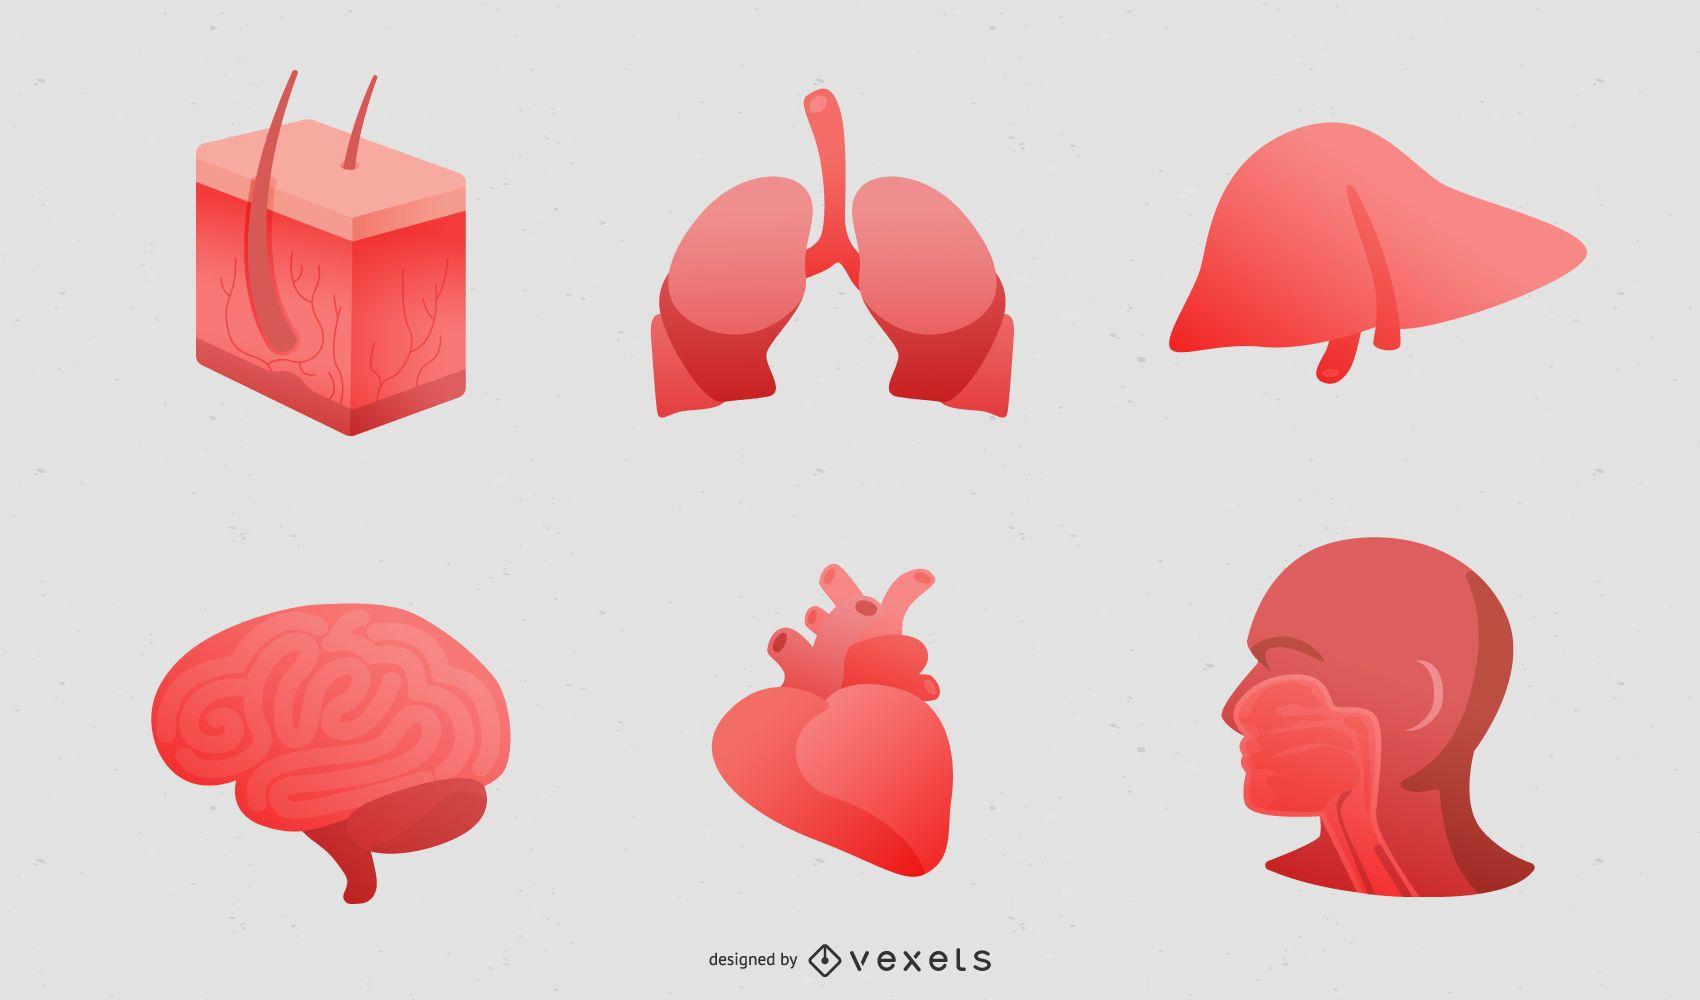 Perspective Of Human Organs Vector